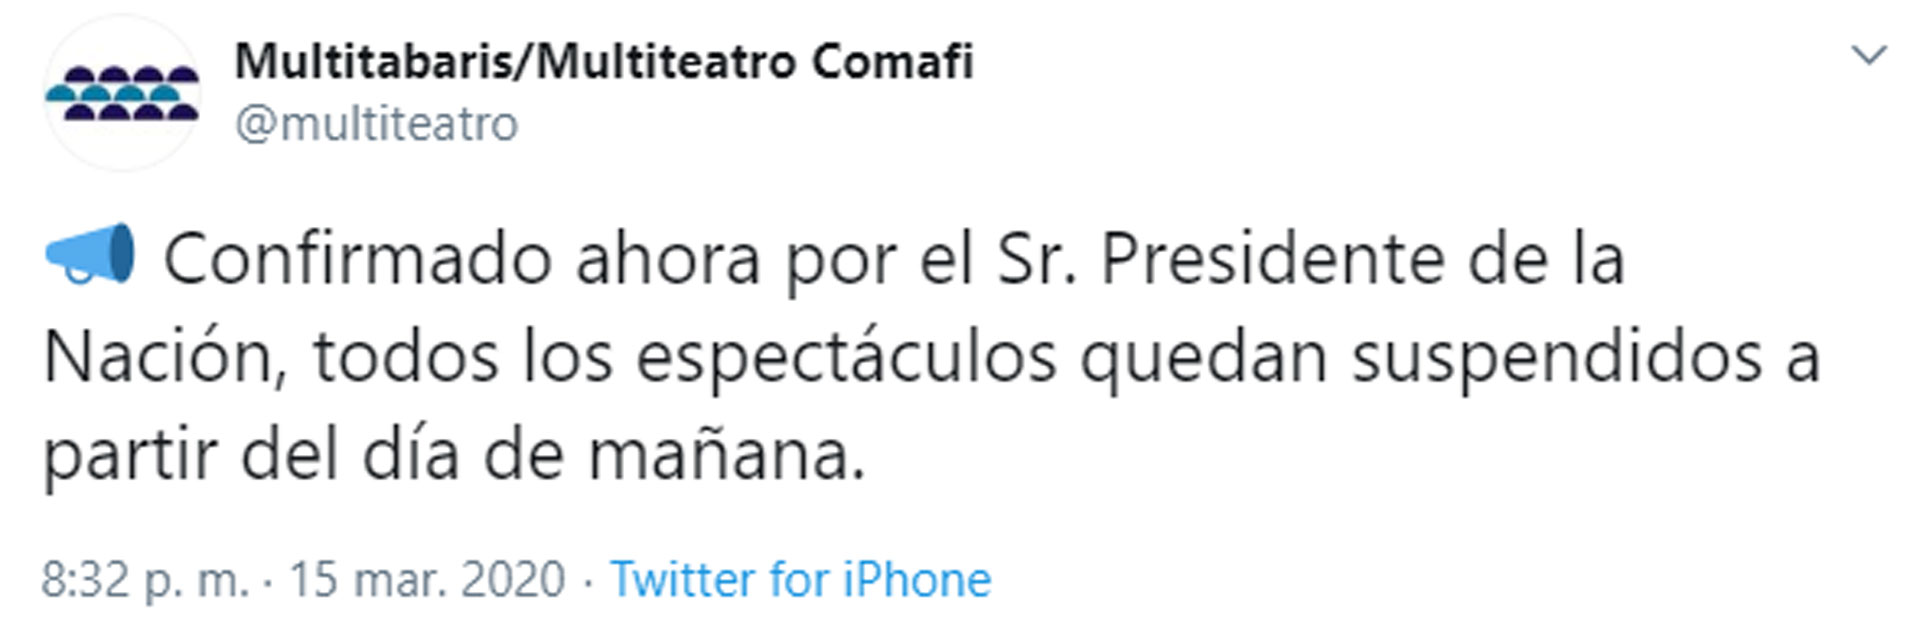 El mensaje de Carlos Rottemberg en Twitter